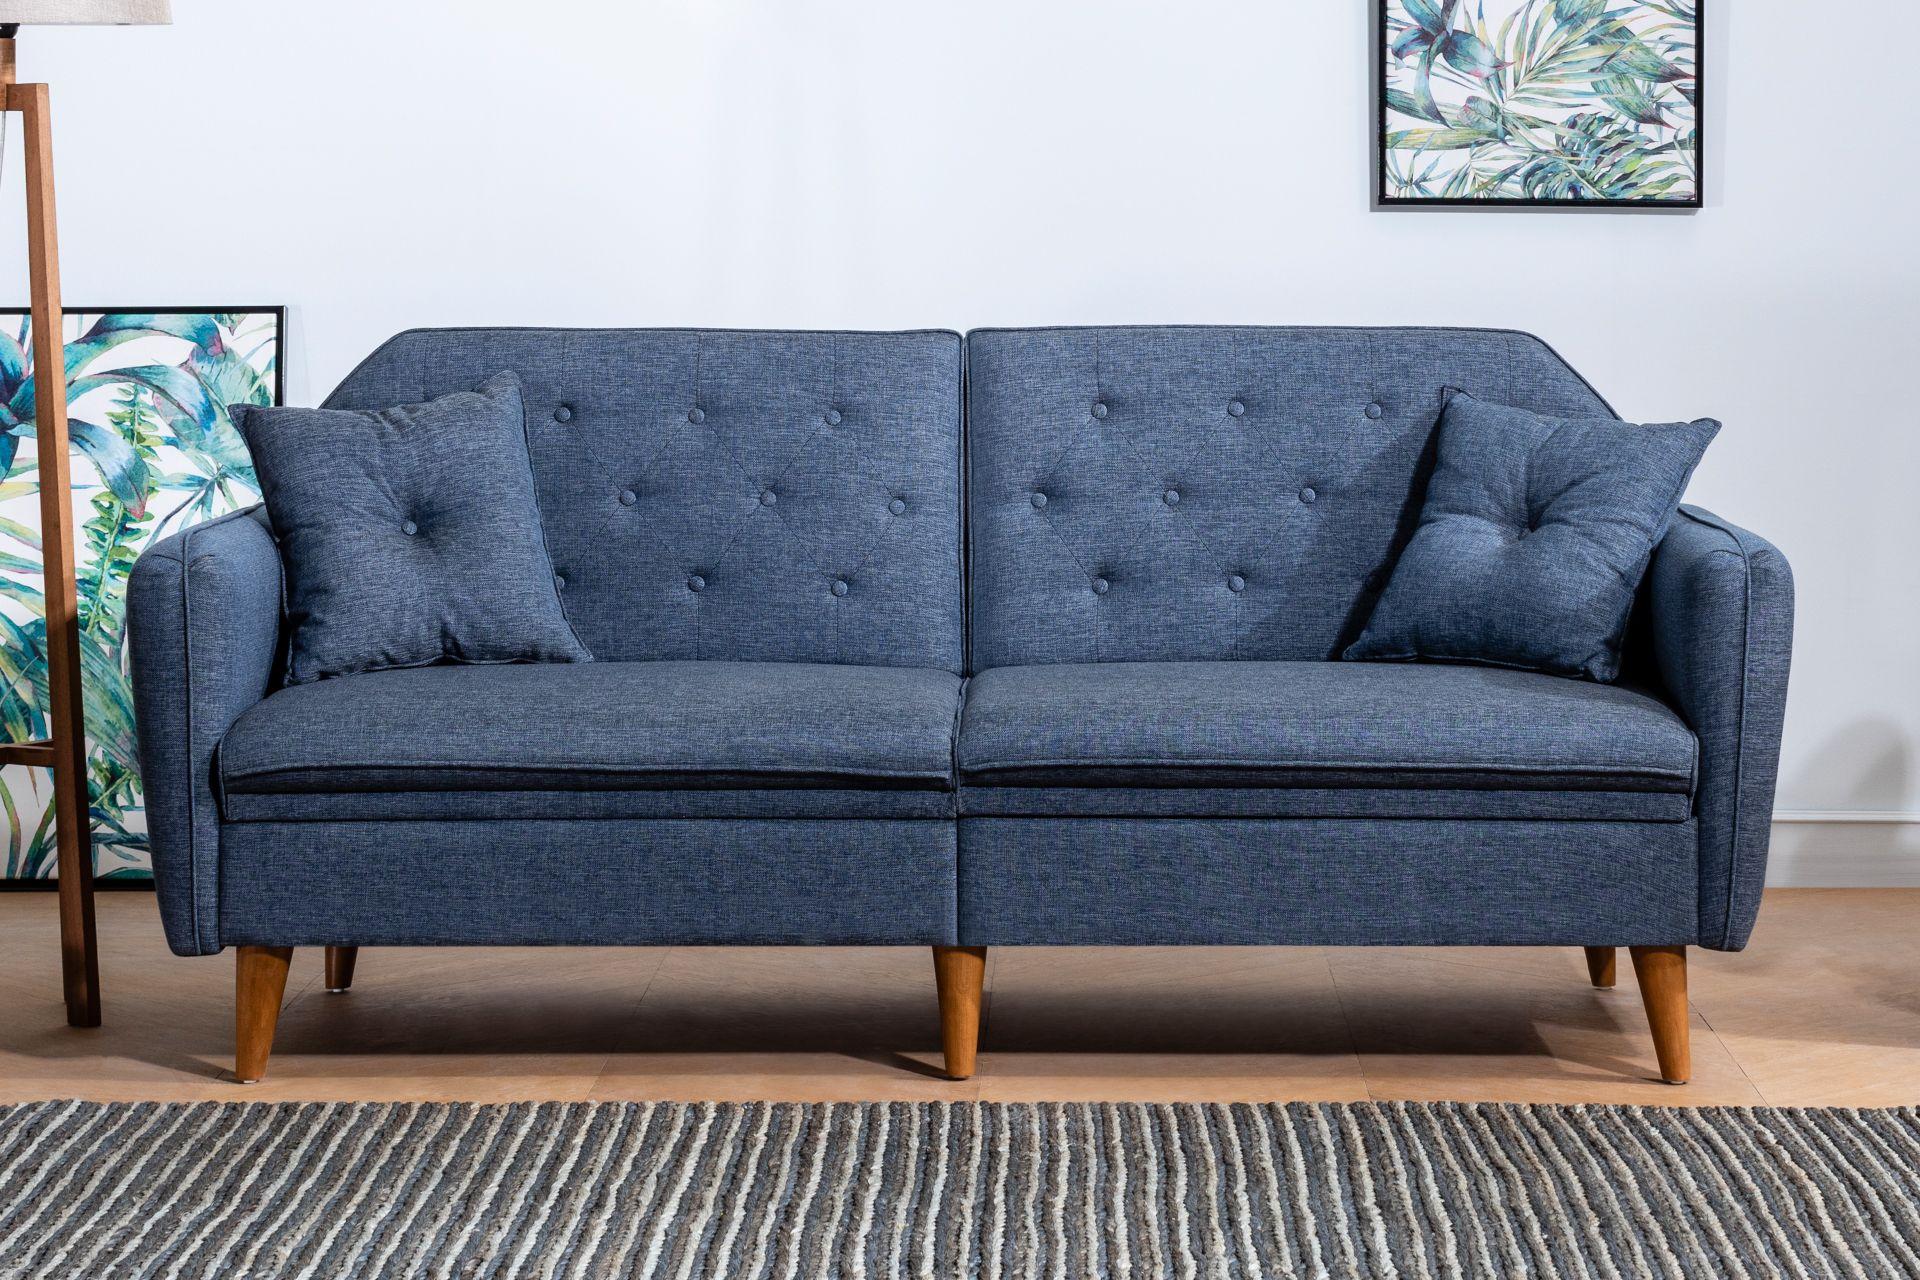 Terra Three Seater Sofa Bed, Navy Blue